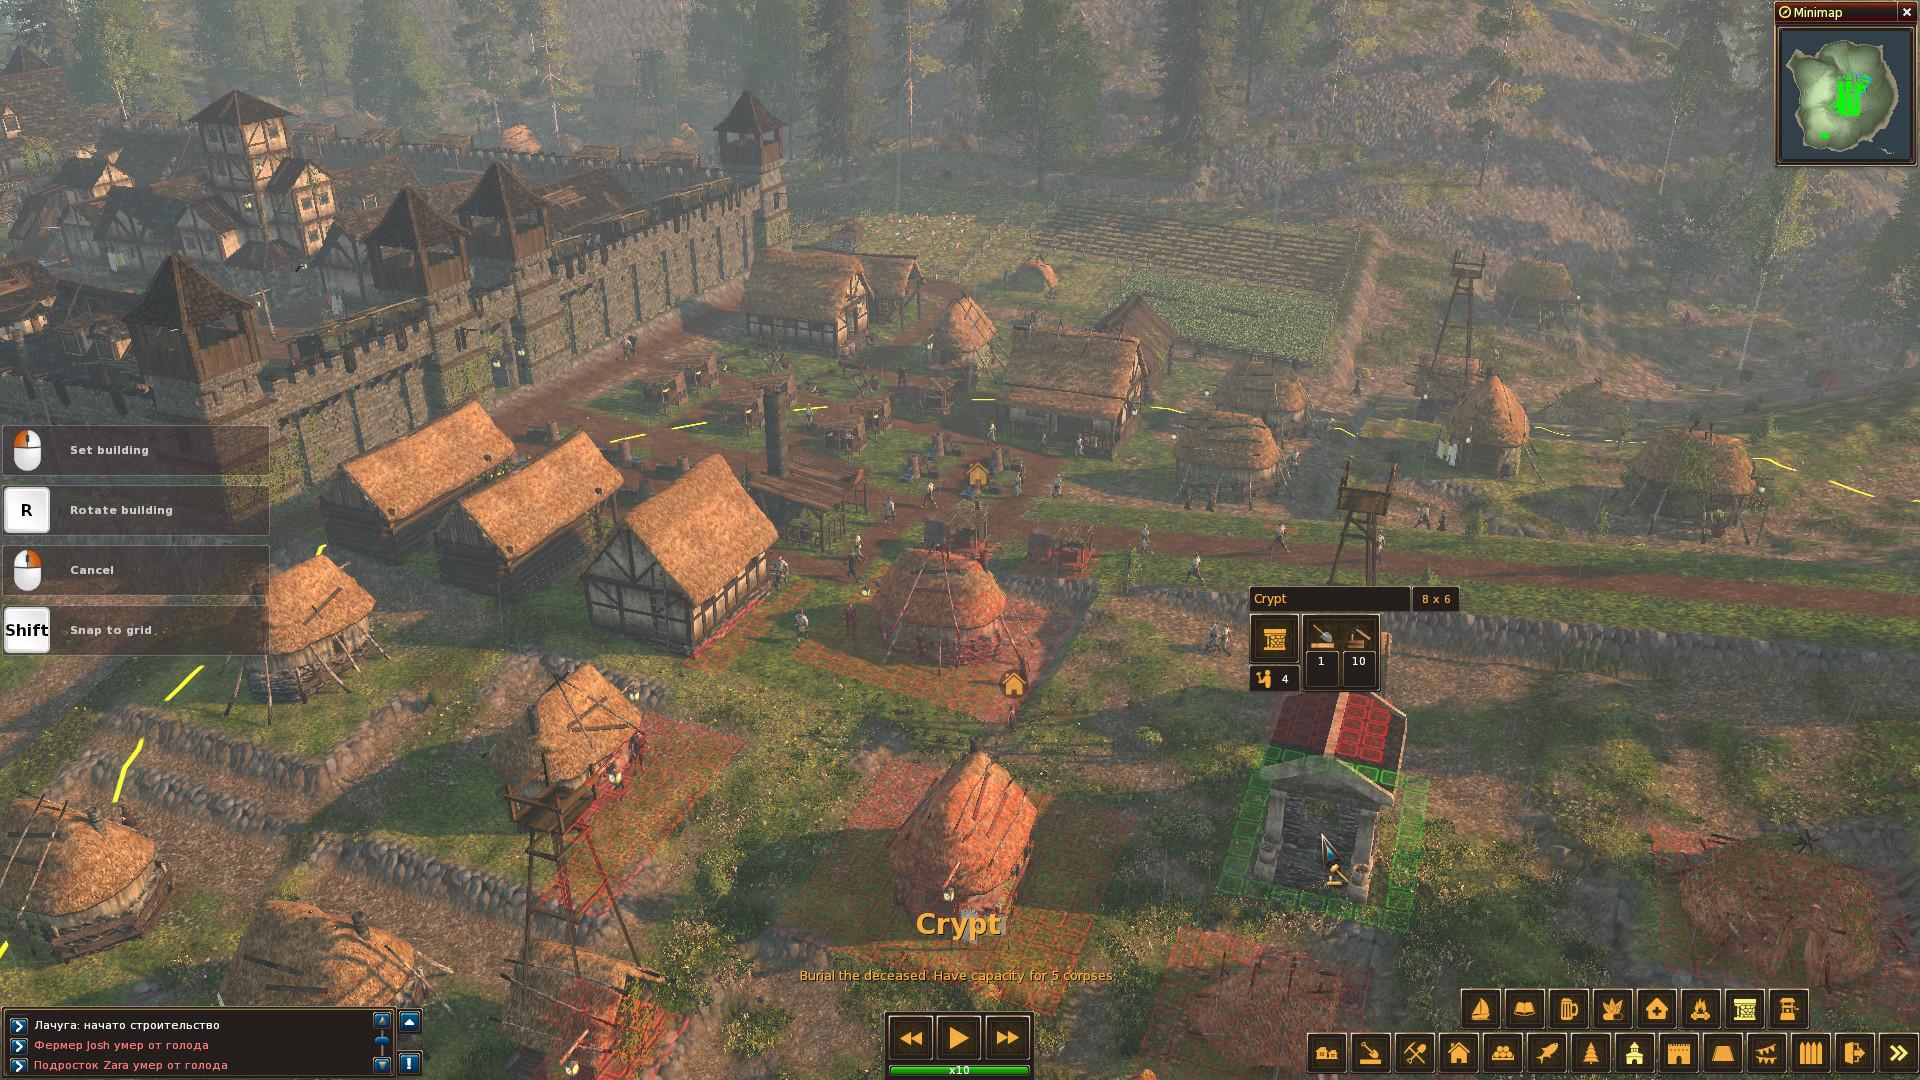 Life is Feudal Forest Village on Steam #0: ss e15a96d58e80afac8901a db d1e3ca